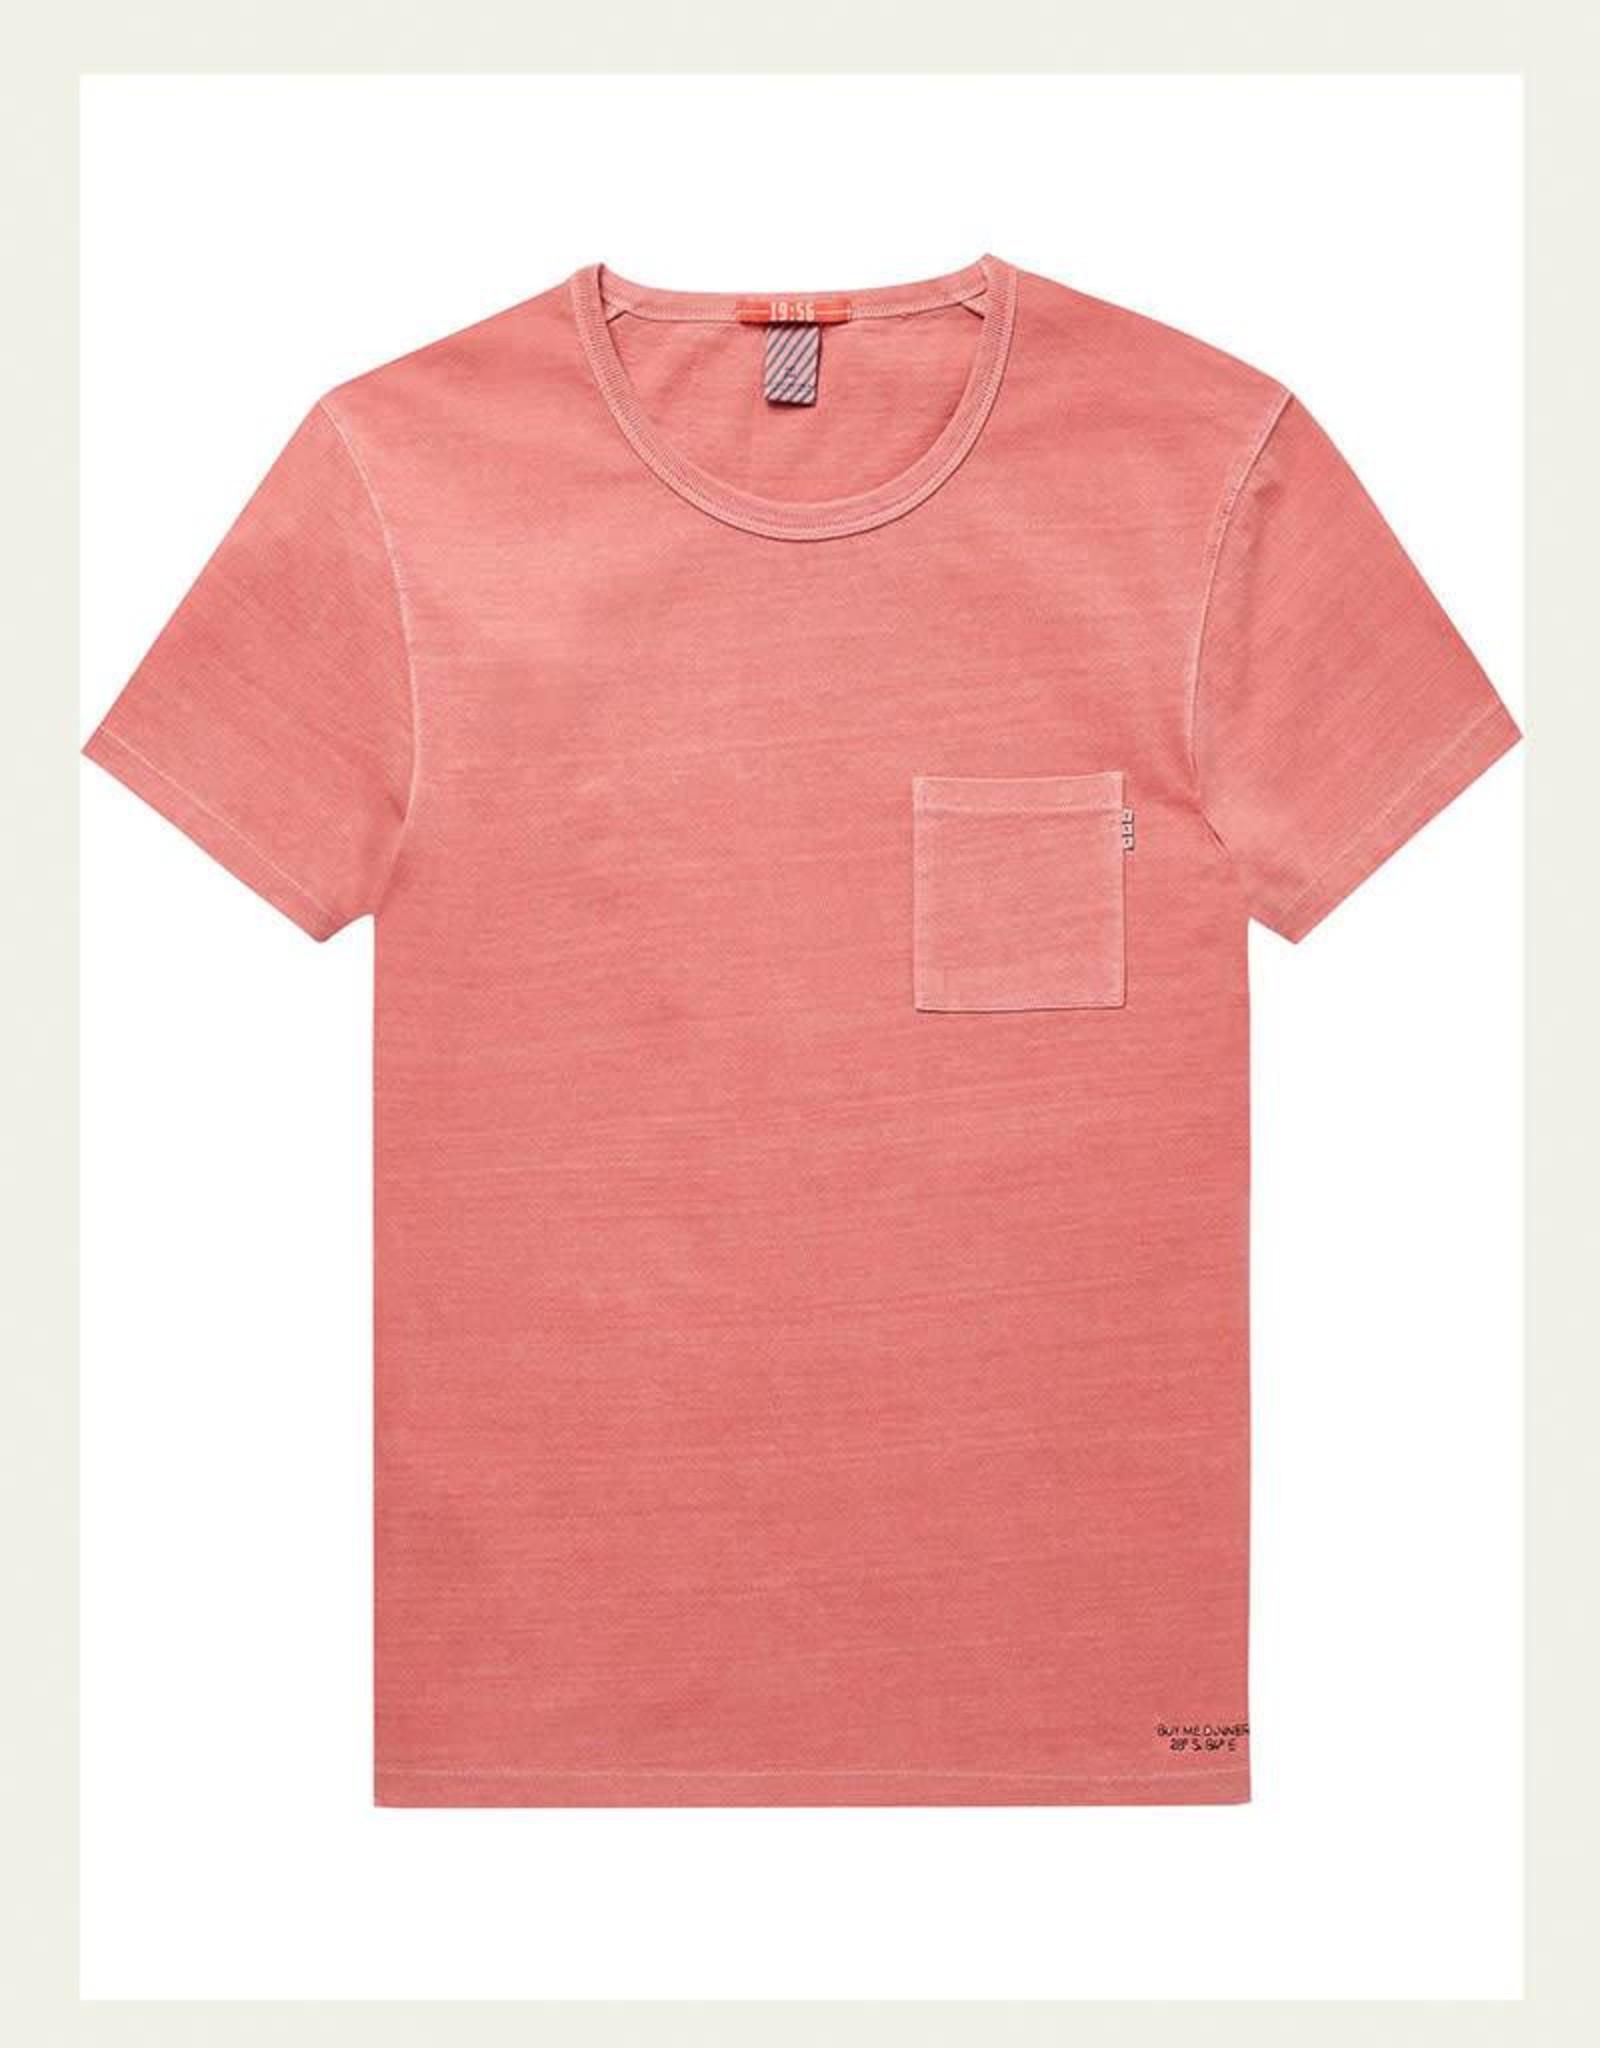 Scotch & Soda Garment Dyed Regular Tee 144216 | Safran